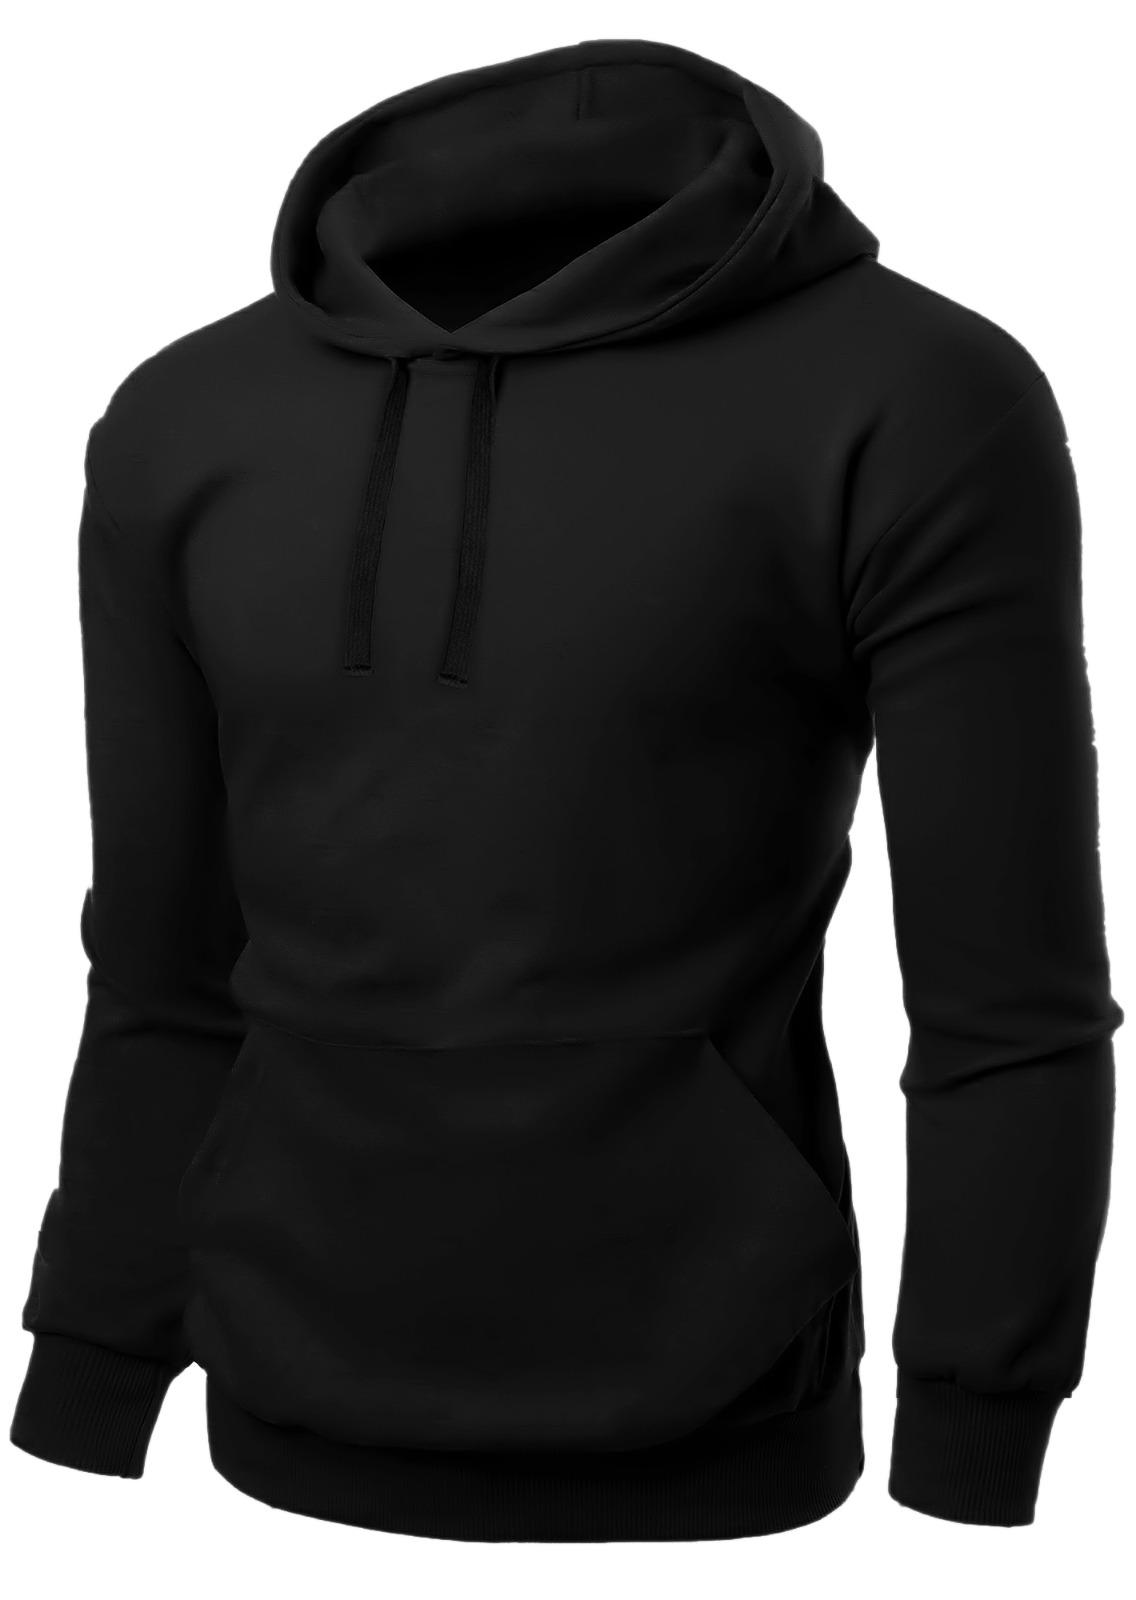 Unisex Fleece Pullover Black Hoodie